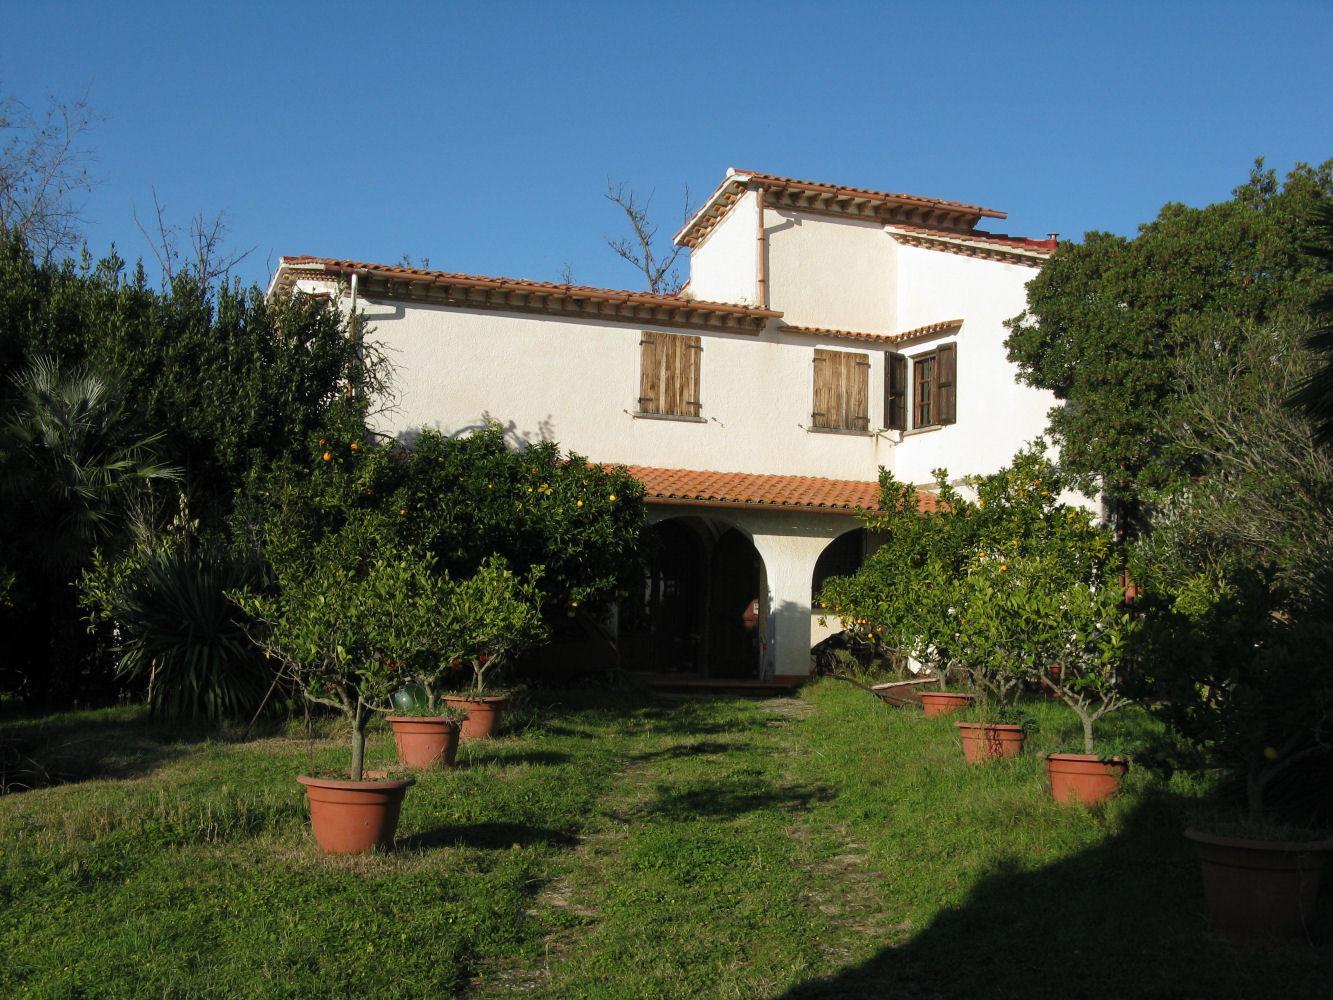 Agriturismo in Vendita a Lorenzana, Crespina Lorenzana (PI)